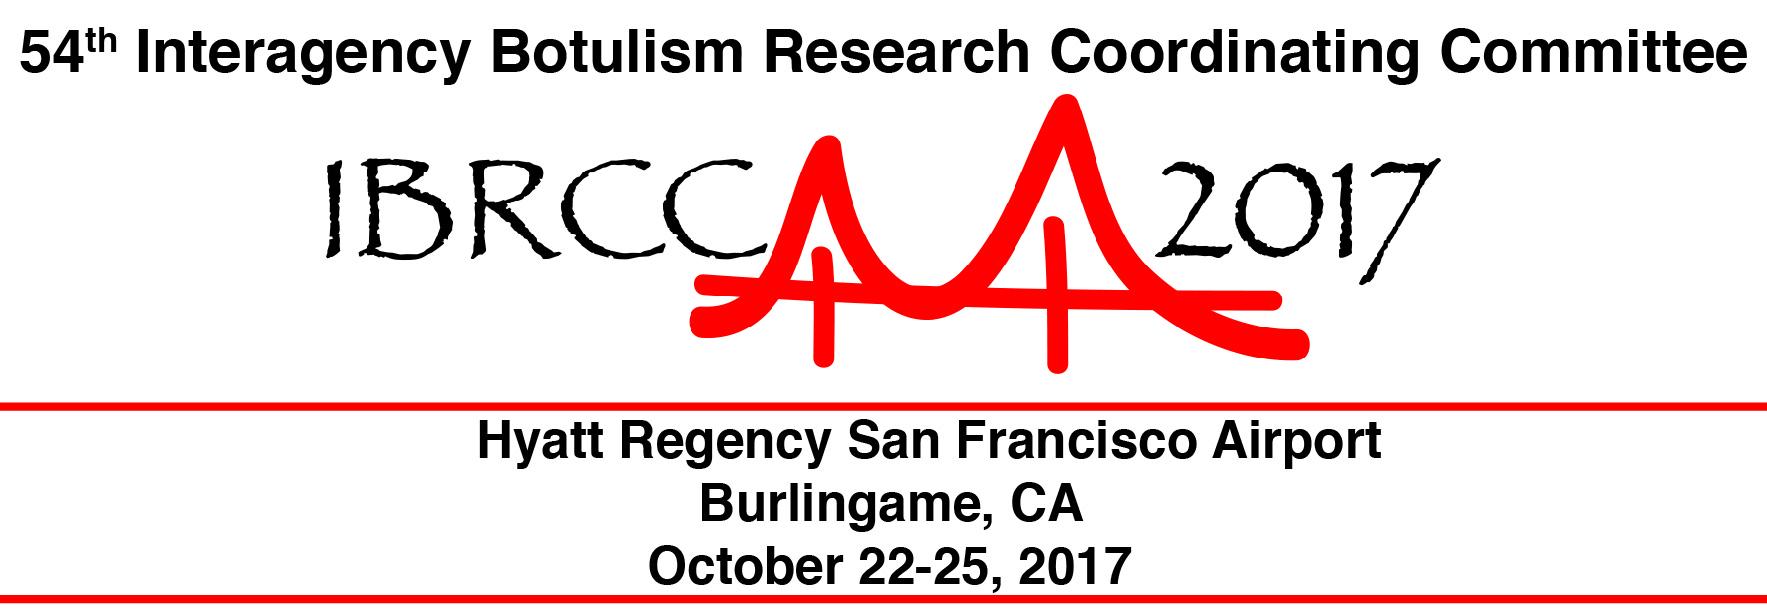 Interagency Botulism Research Coordinating Committee (IBRCC) Meeting 2017